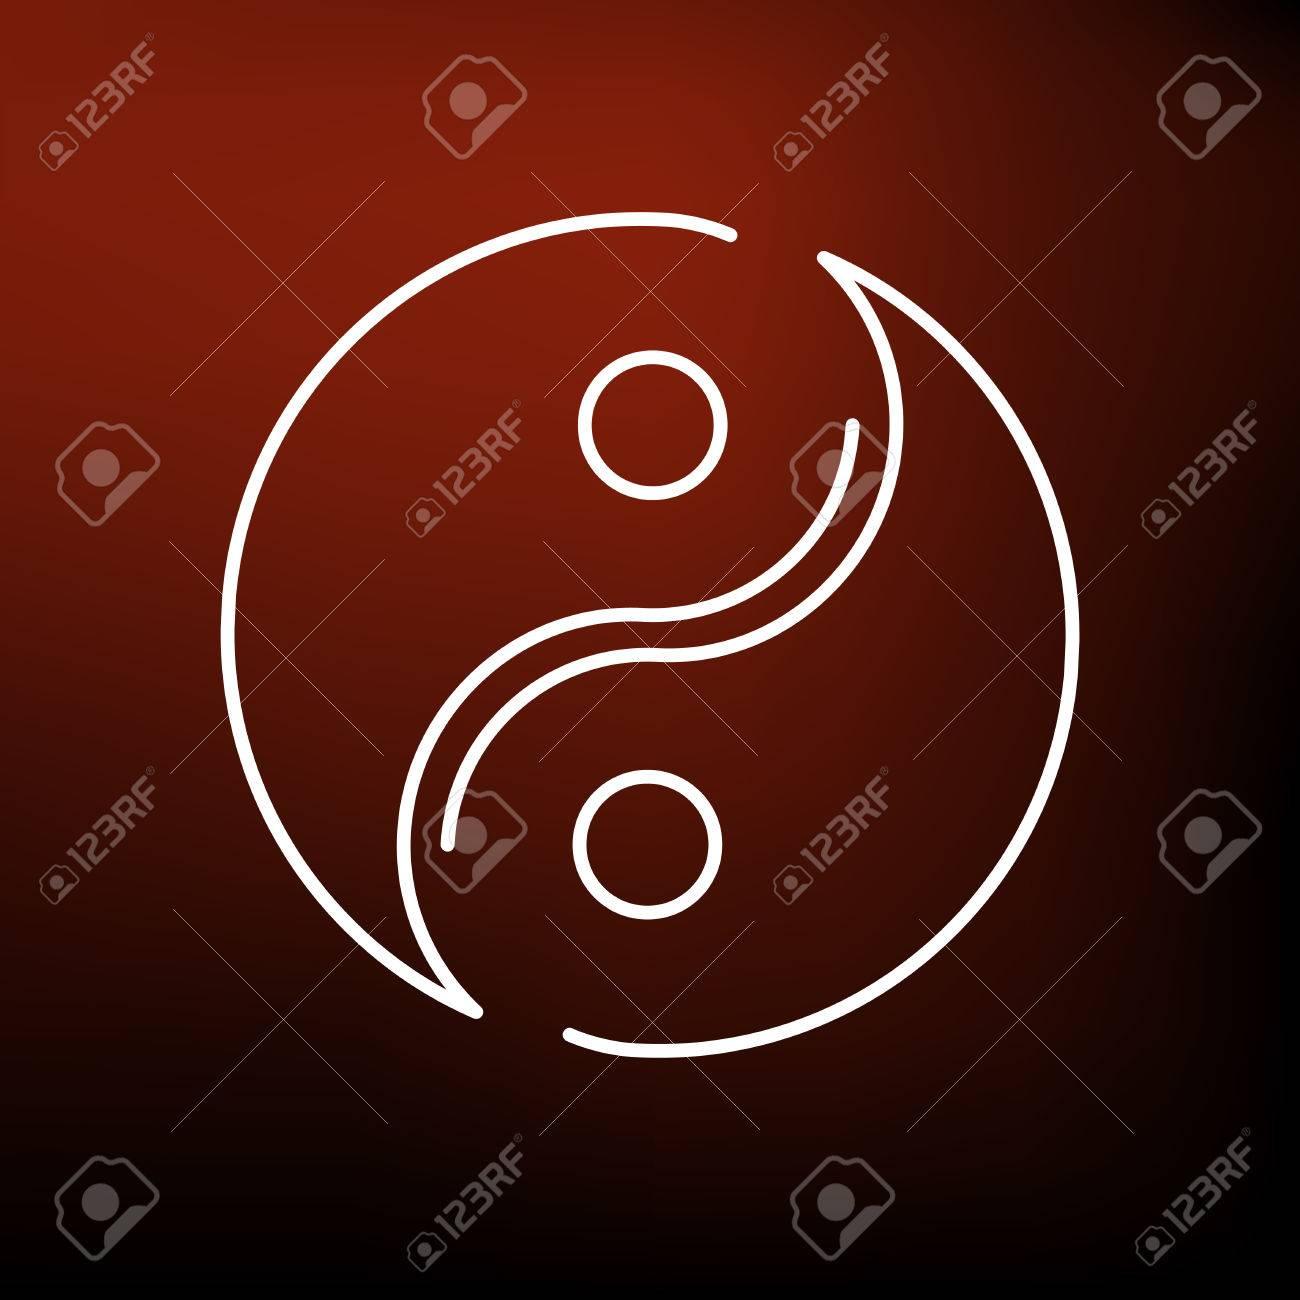 Asian Yin Yang Icon Yin Yang Sign Yin Yang Symbol Thin Line